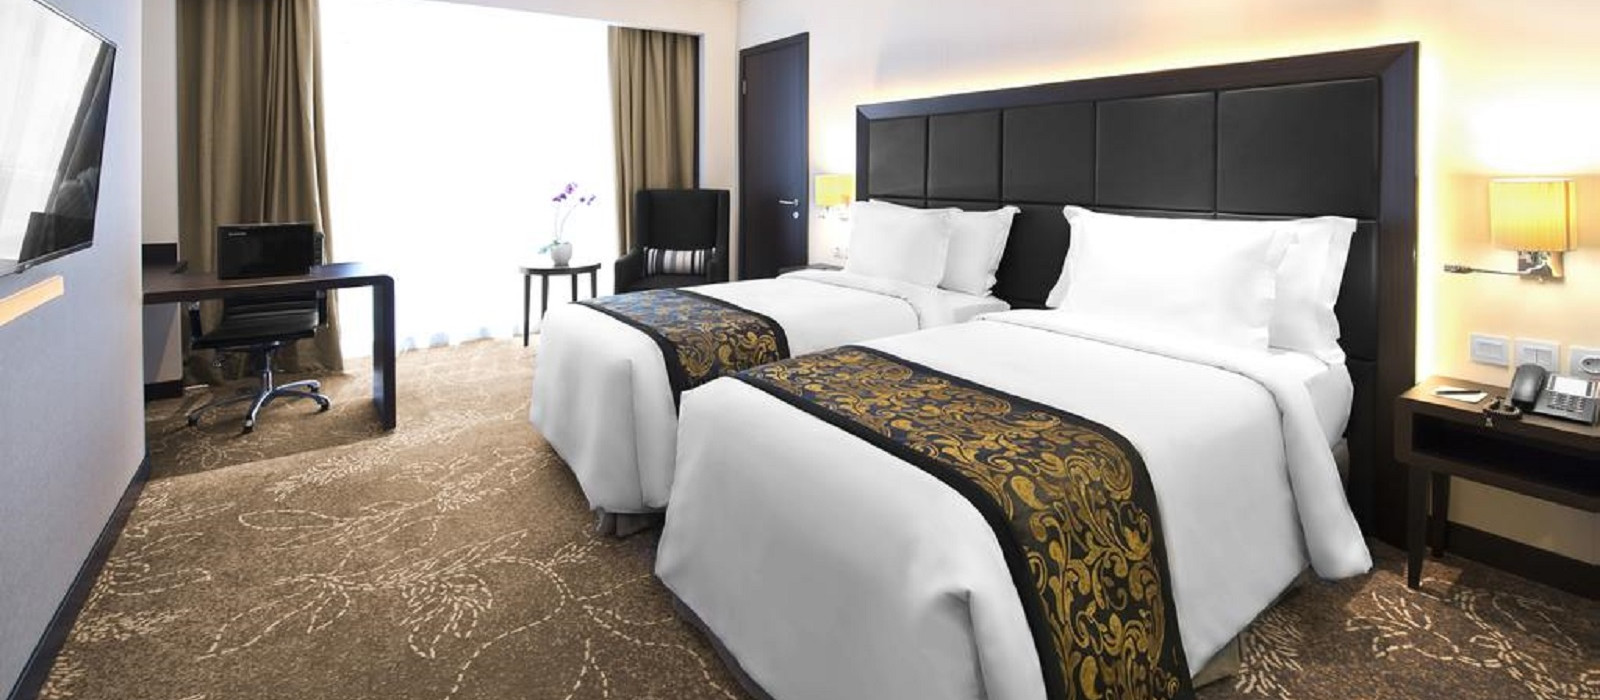 Hotel Melia Makassar Indonesien